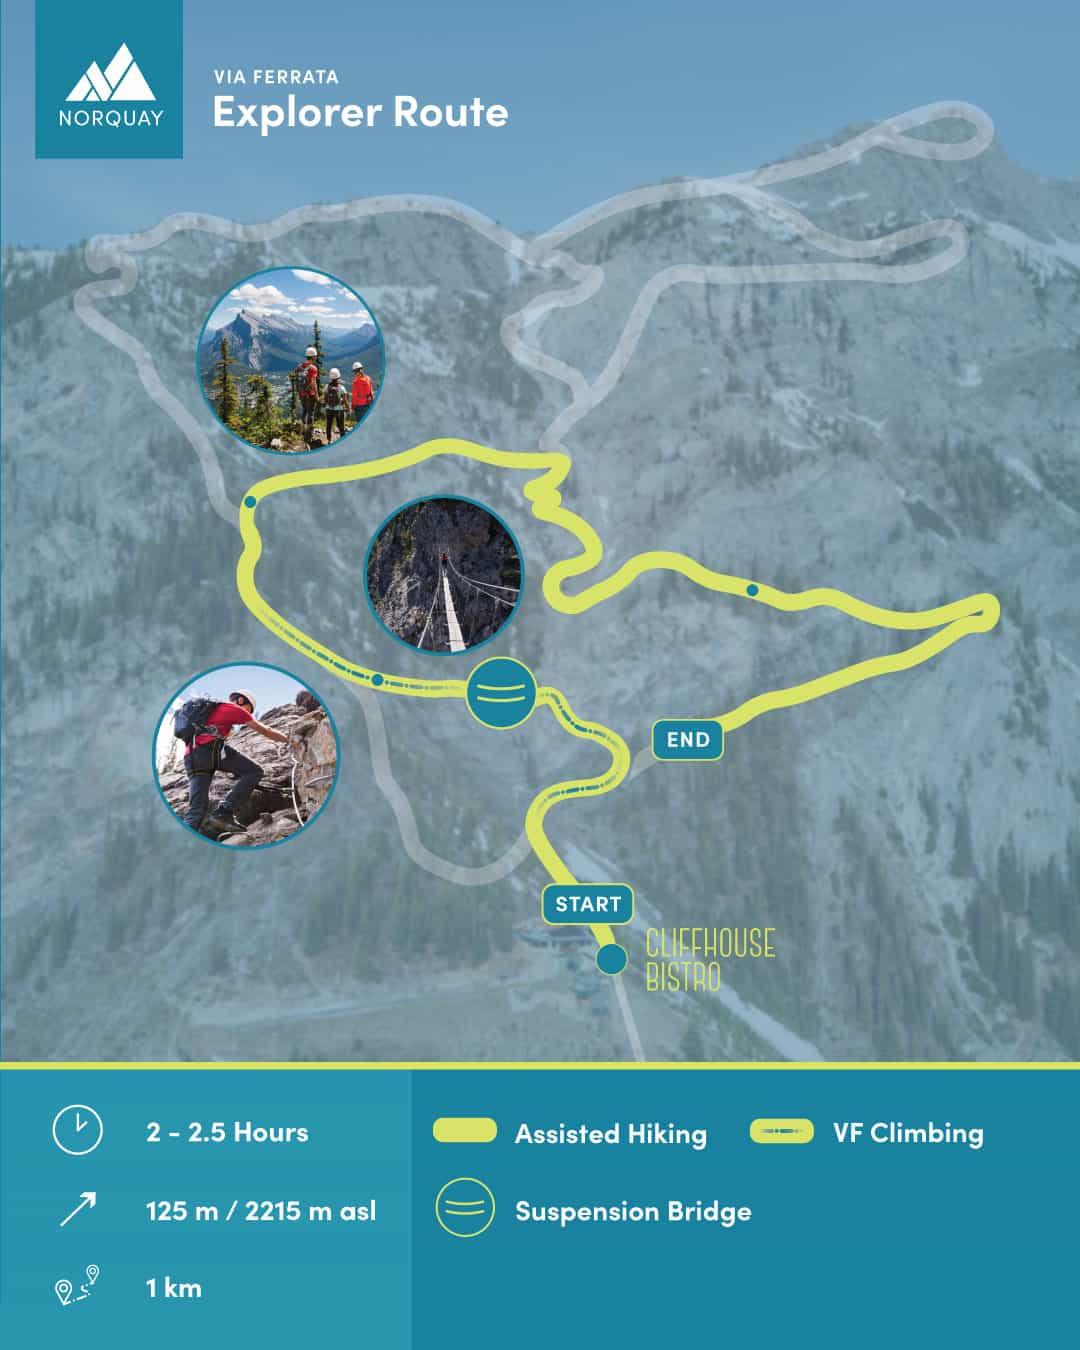 Via Ferrata Explorer Route Map at Banff Mt Norquay